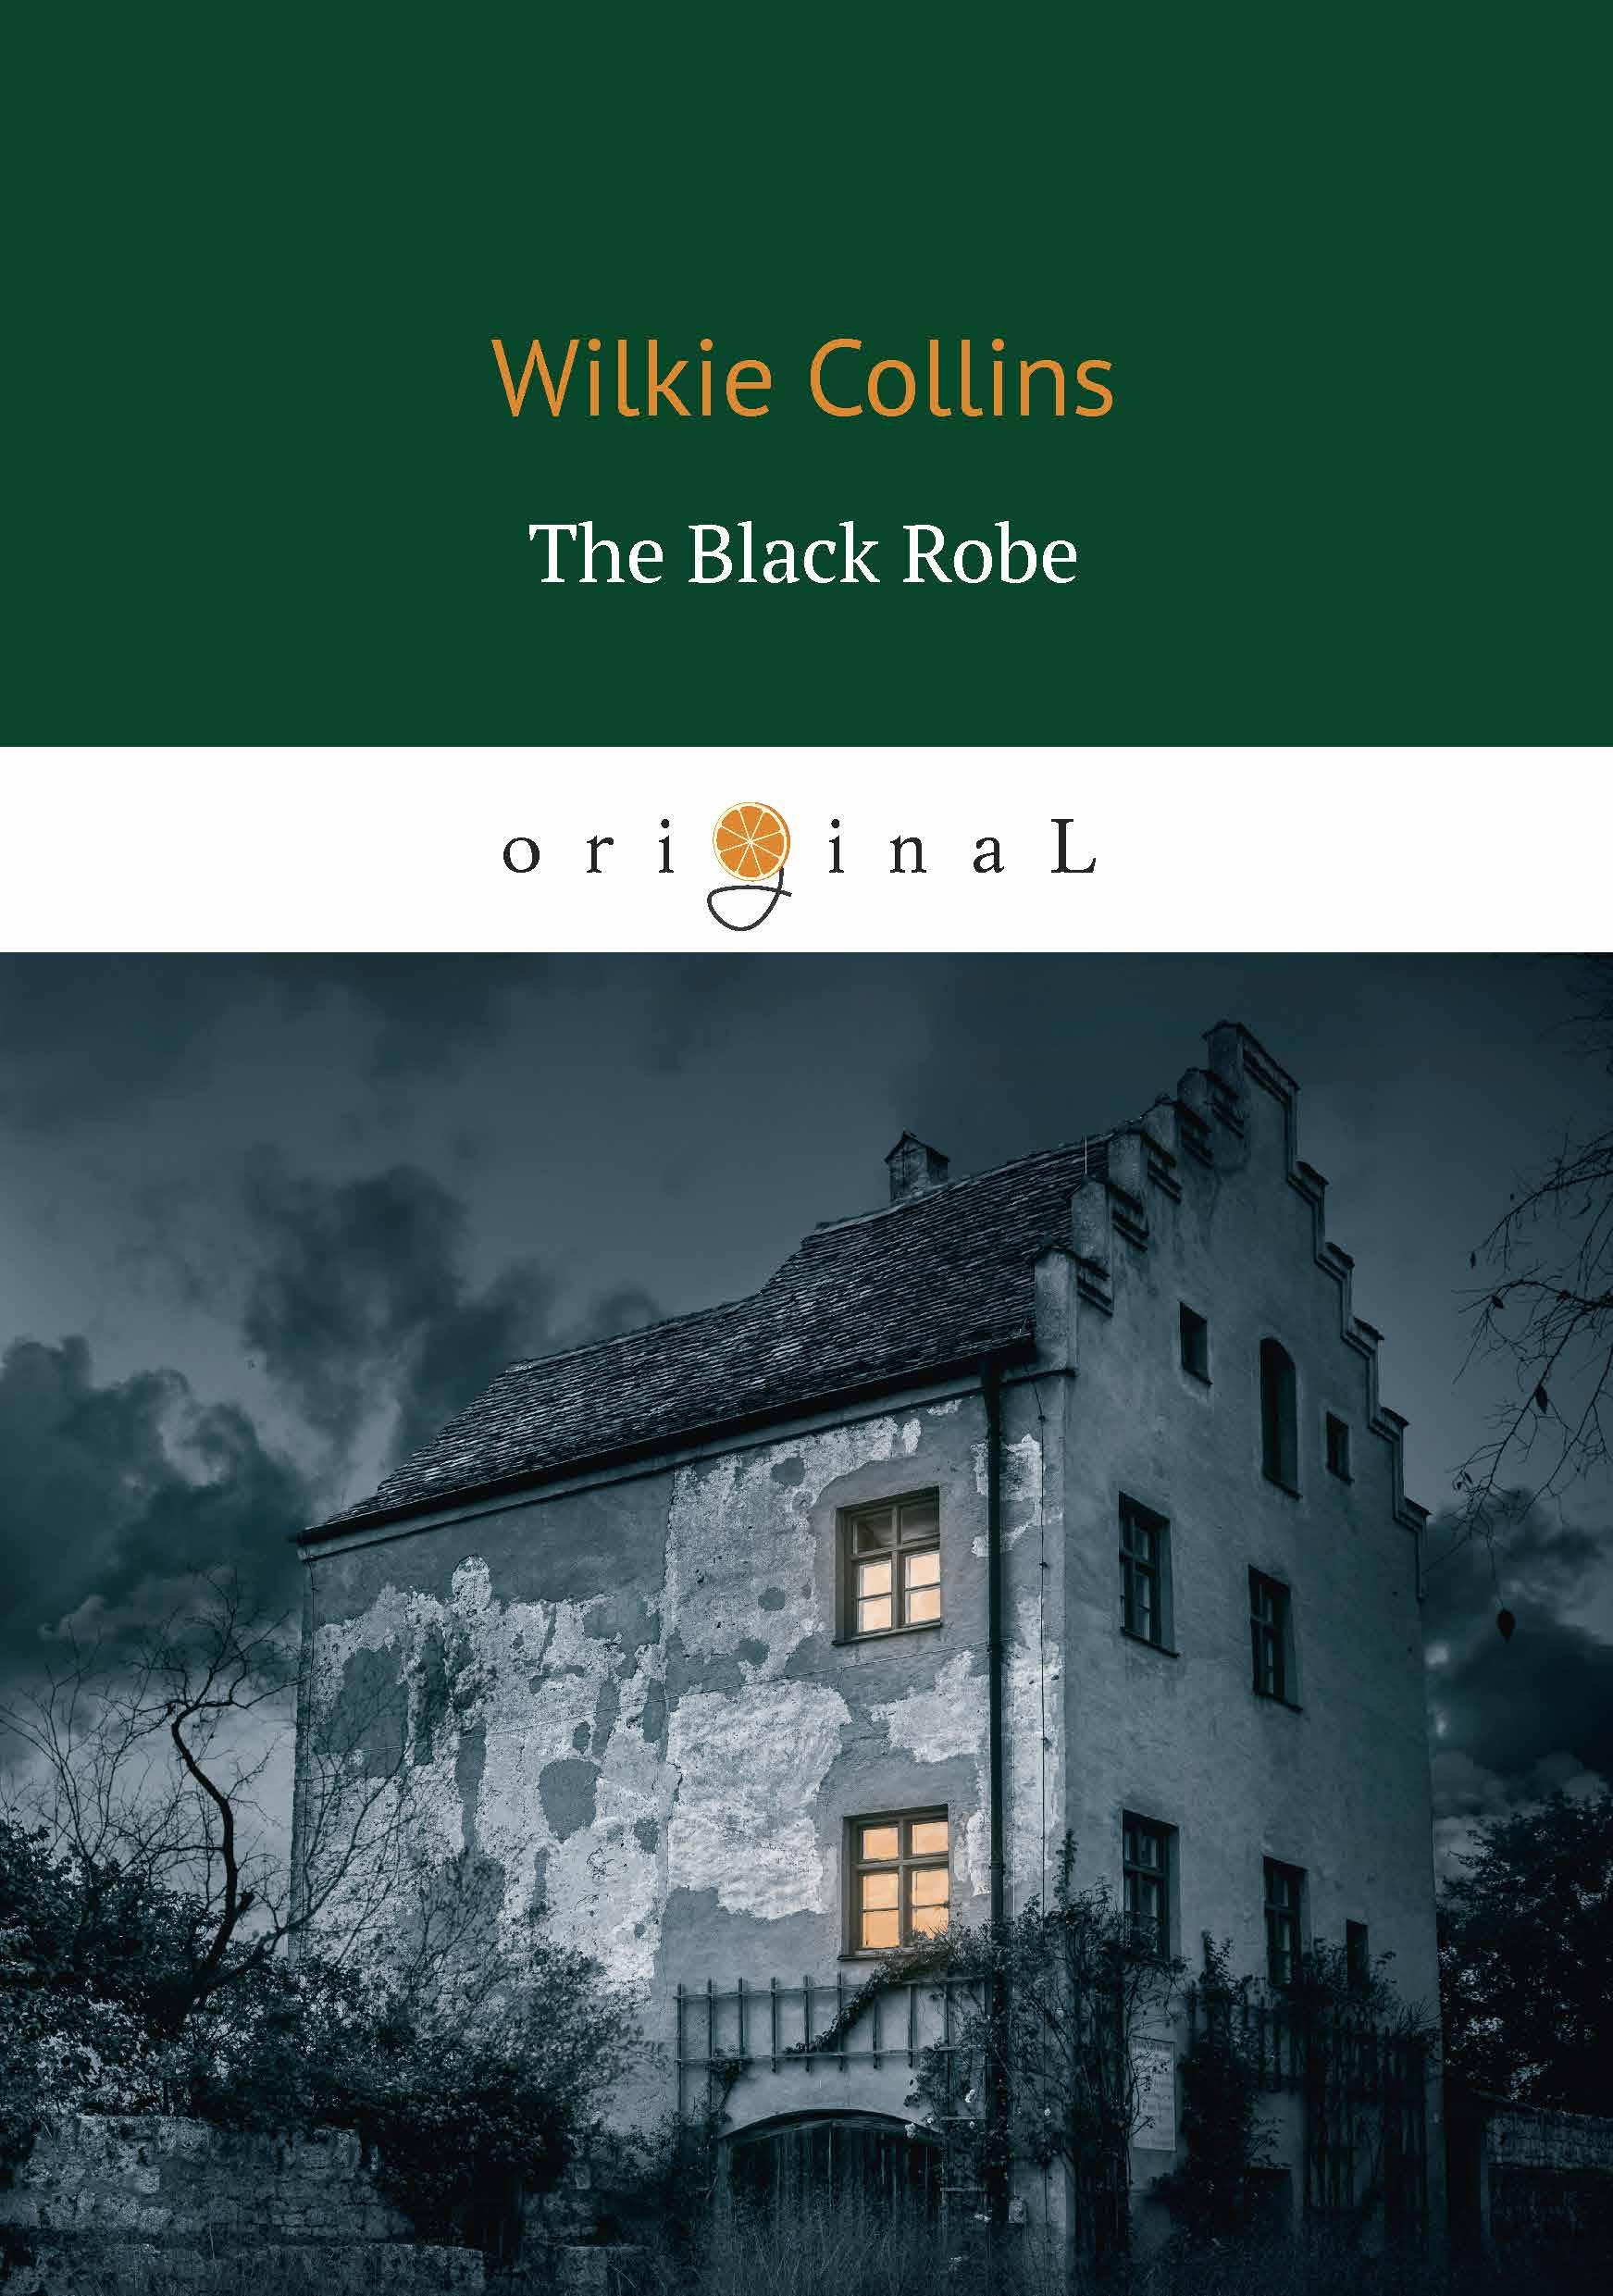 Wilkie Collins The Black Robe / Человек в чёрном wilkie collins the black robe человек в чёрном